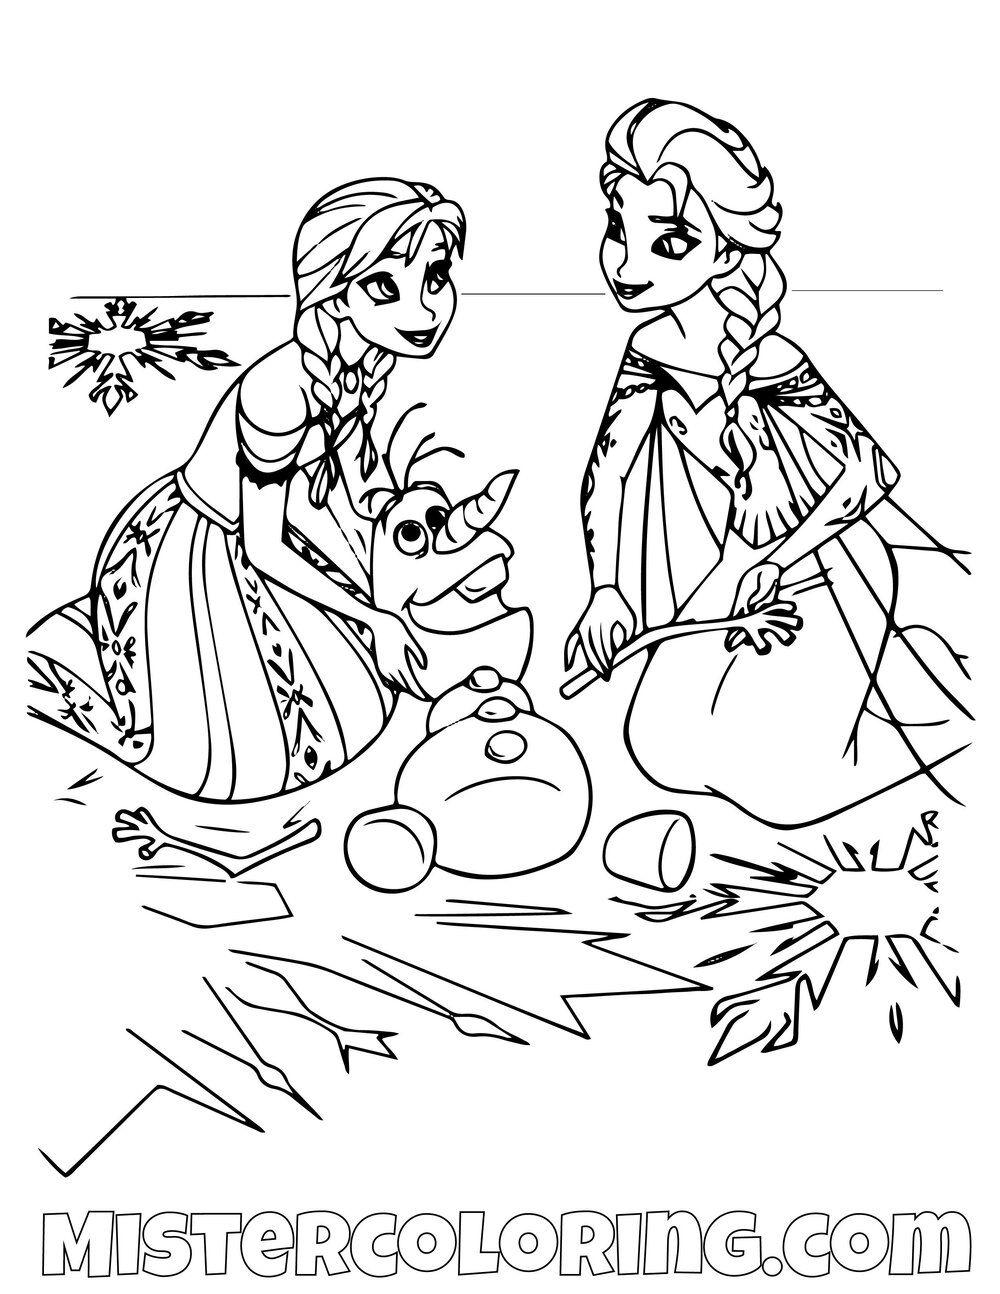 Queen Elsa And Princess Anna Fixing Olaf Frozen 2 Coloring Pages For Kids Elsa Coloring Pages Frozen Coloring Pages Disney Princess Coloring Pages